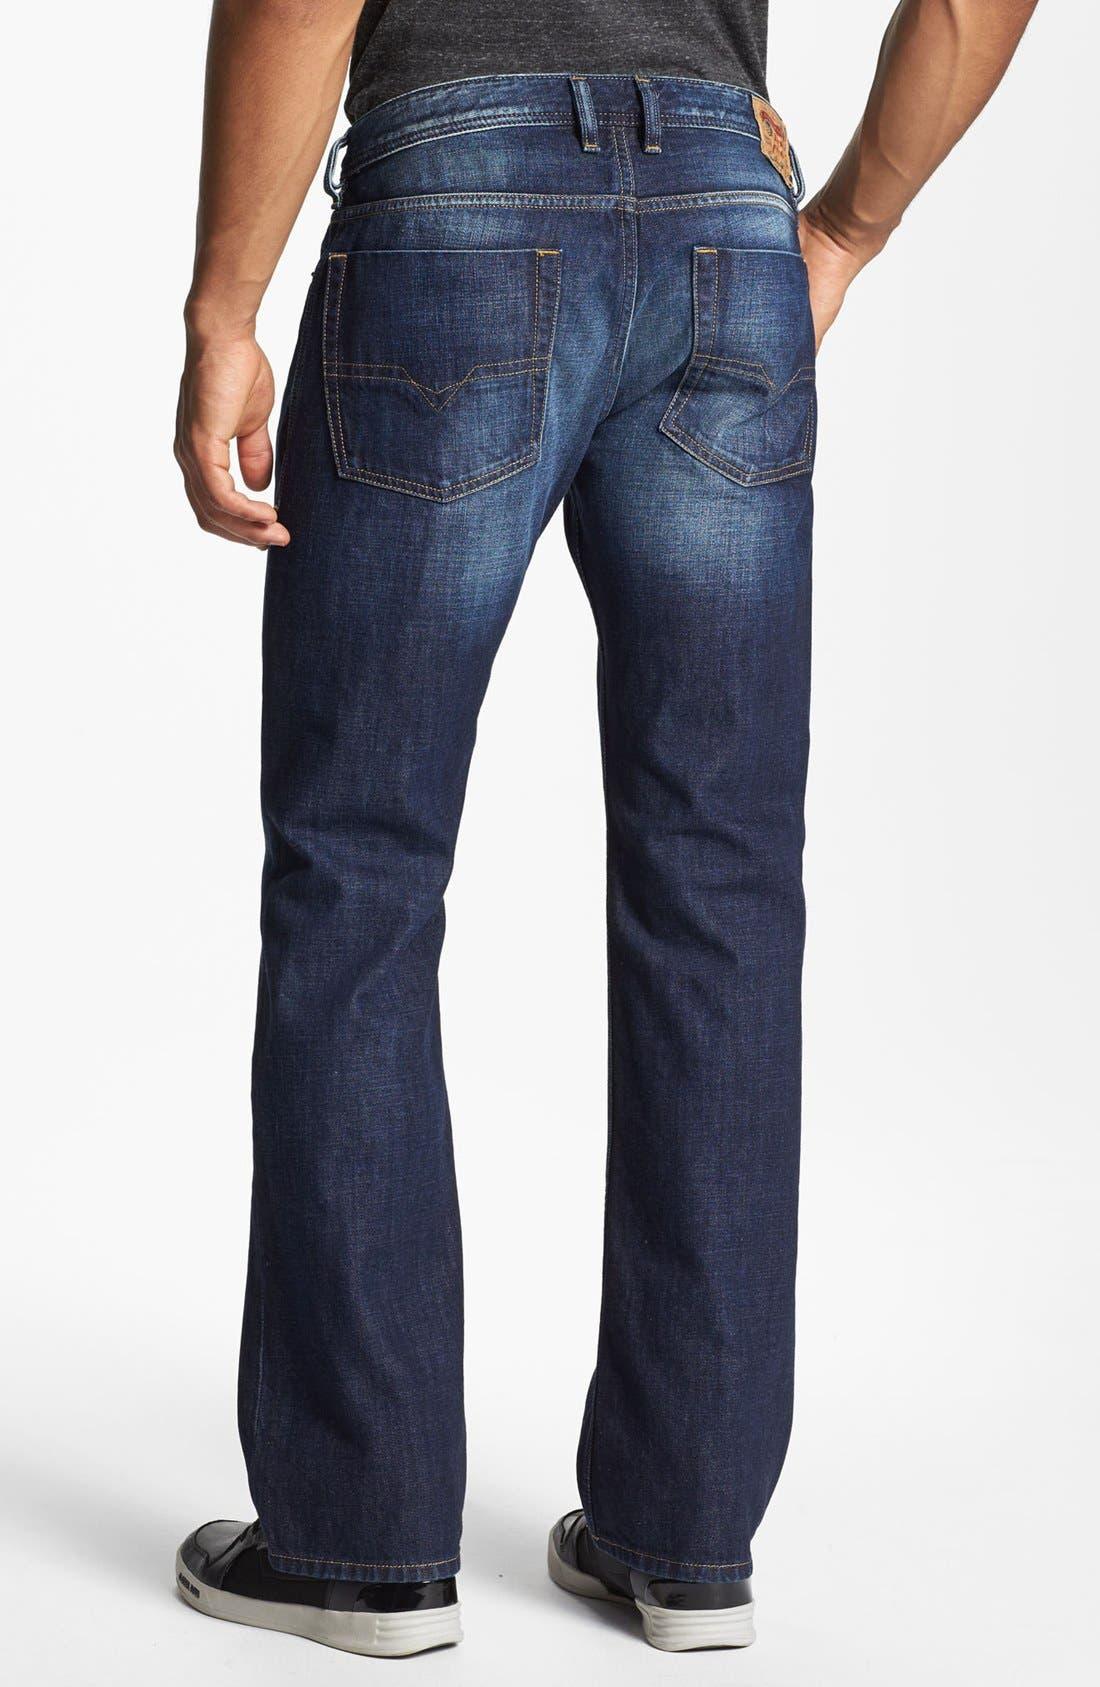 Alternate Image 1 Selected - DIESEL® 'Zatiny' Bootcut Jeans (074W)